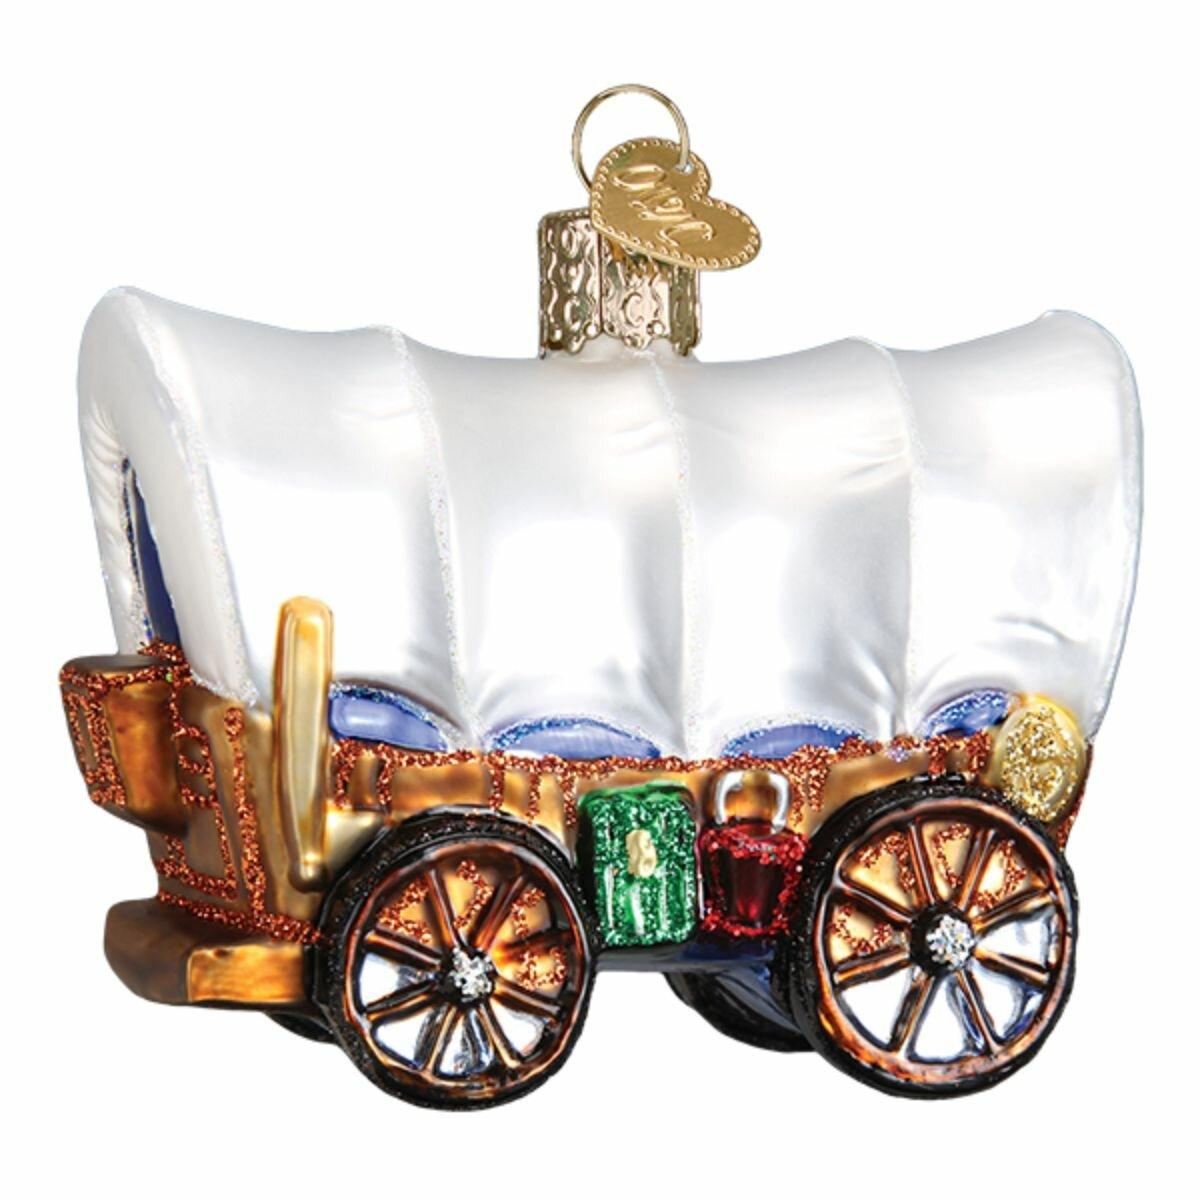 Old World Christmas Covered Wagon Hanging Figurine Ornament Wayfair